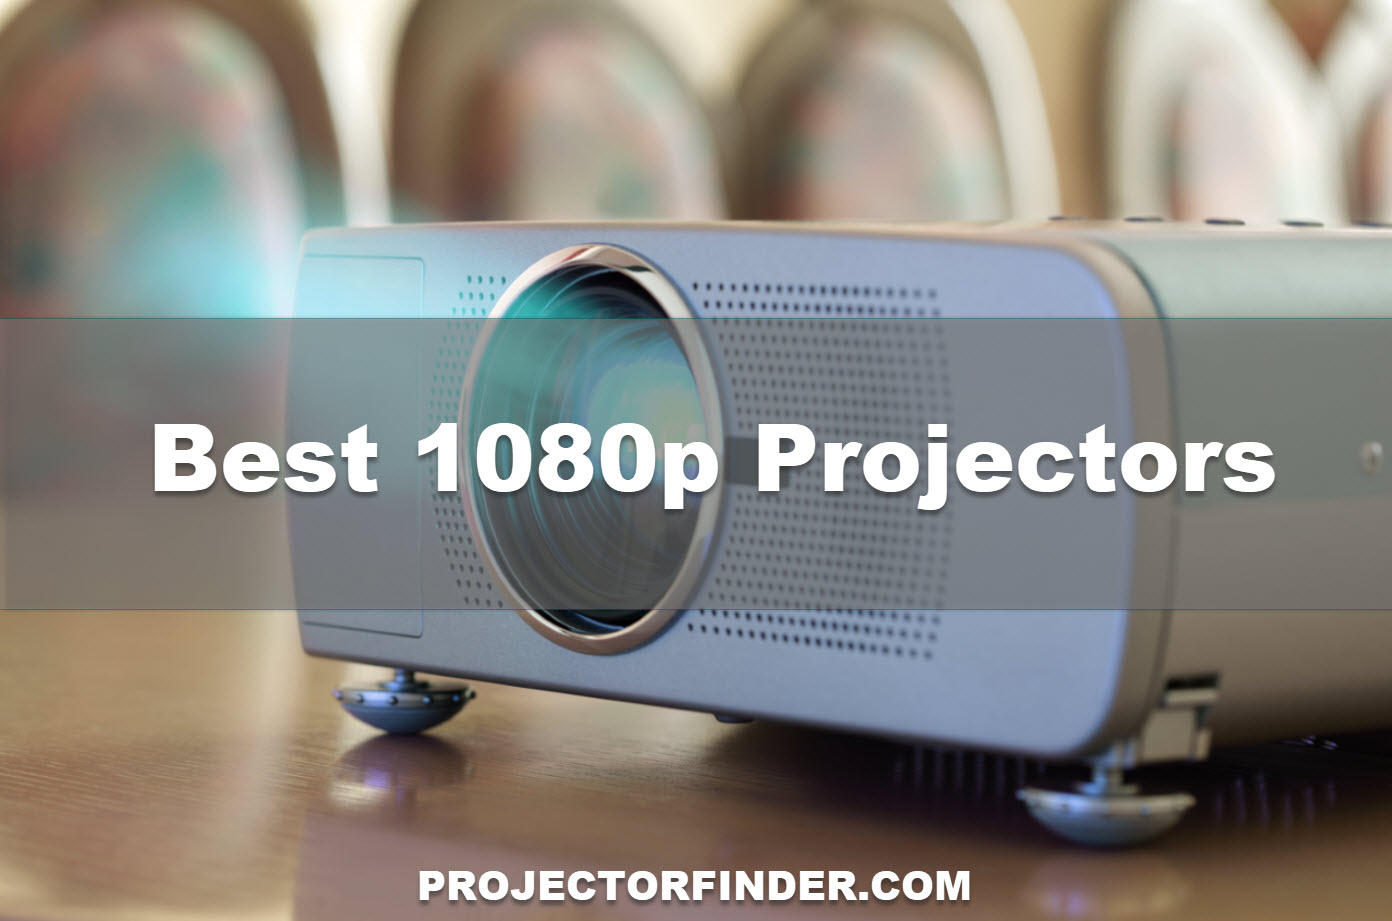 Best 1080p Projectors